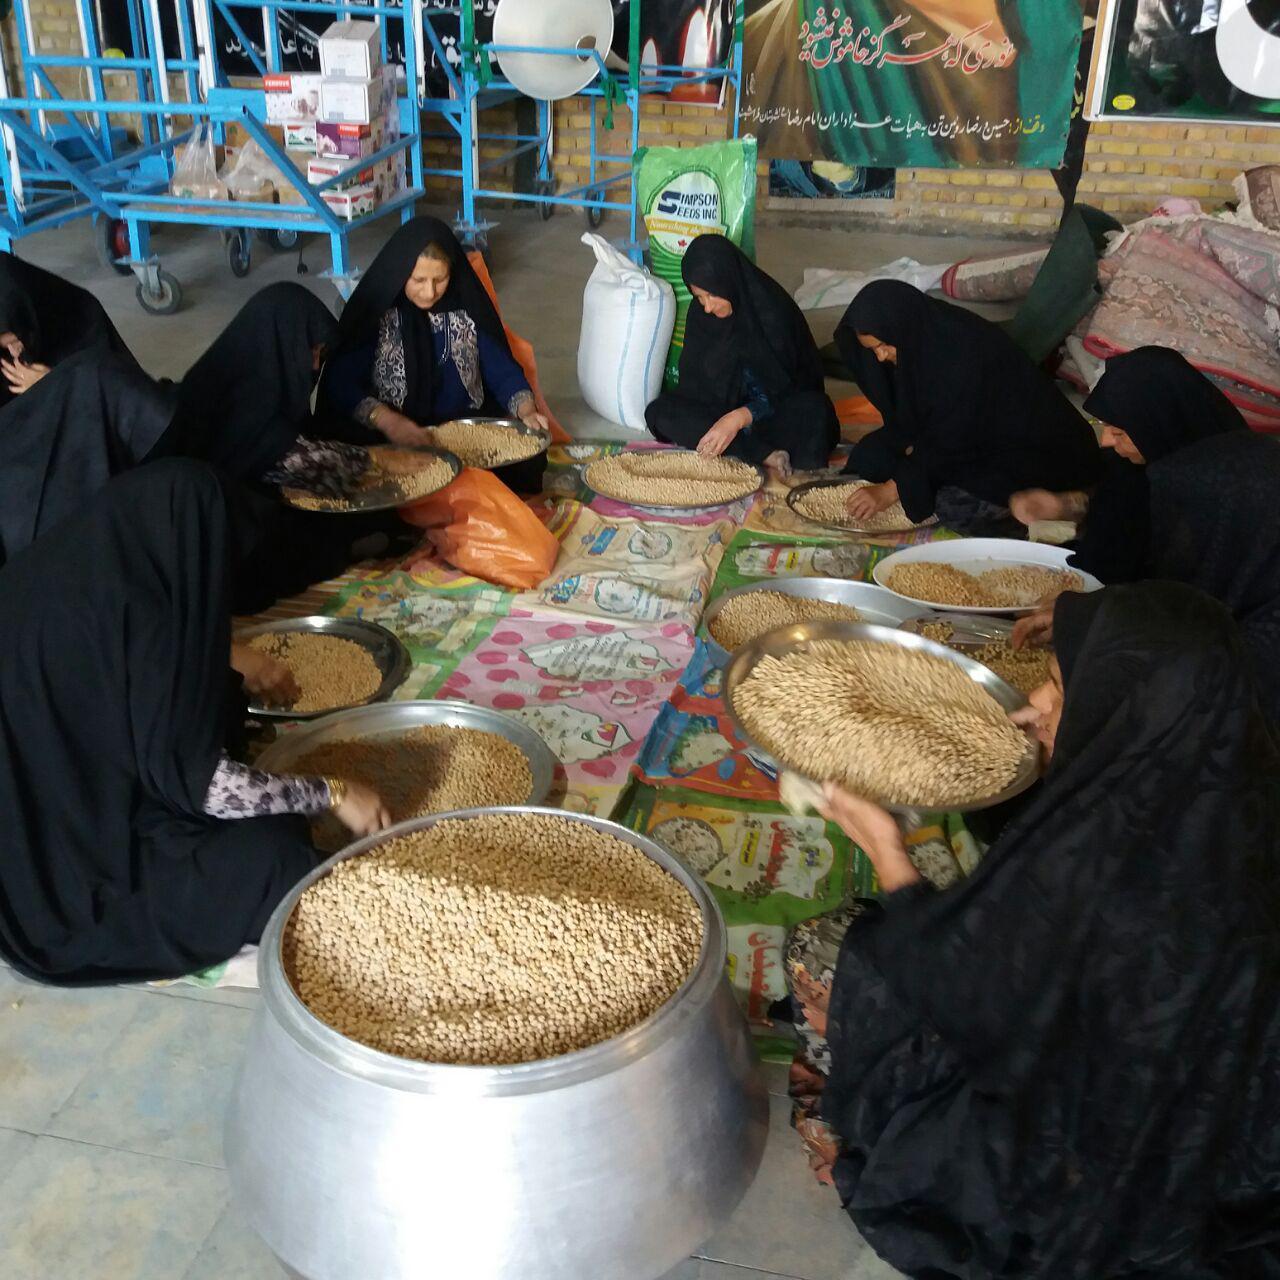 photo_2017-10-19_13-40-59 نان این روزهای زنان فراشبندی به سفرههای مسافران کربلا خواهد رسید